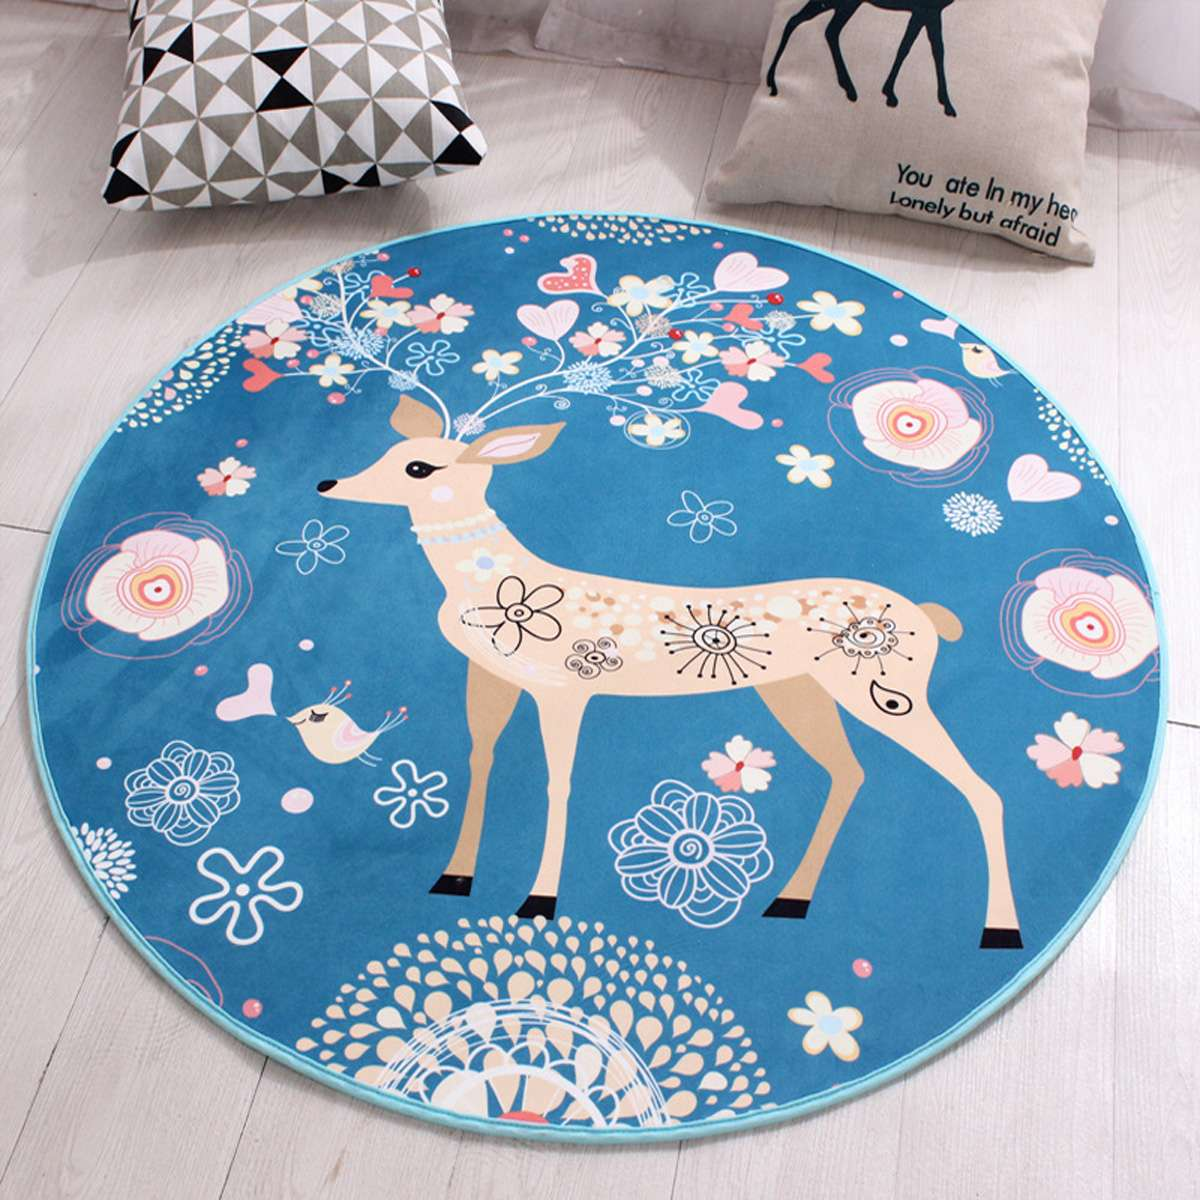 Cute Deer Heart Floral Pattern Round Floor Mats Computer Chair Mat Antiskid Carpet For Living Room Bedroom Kids Room